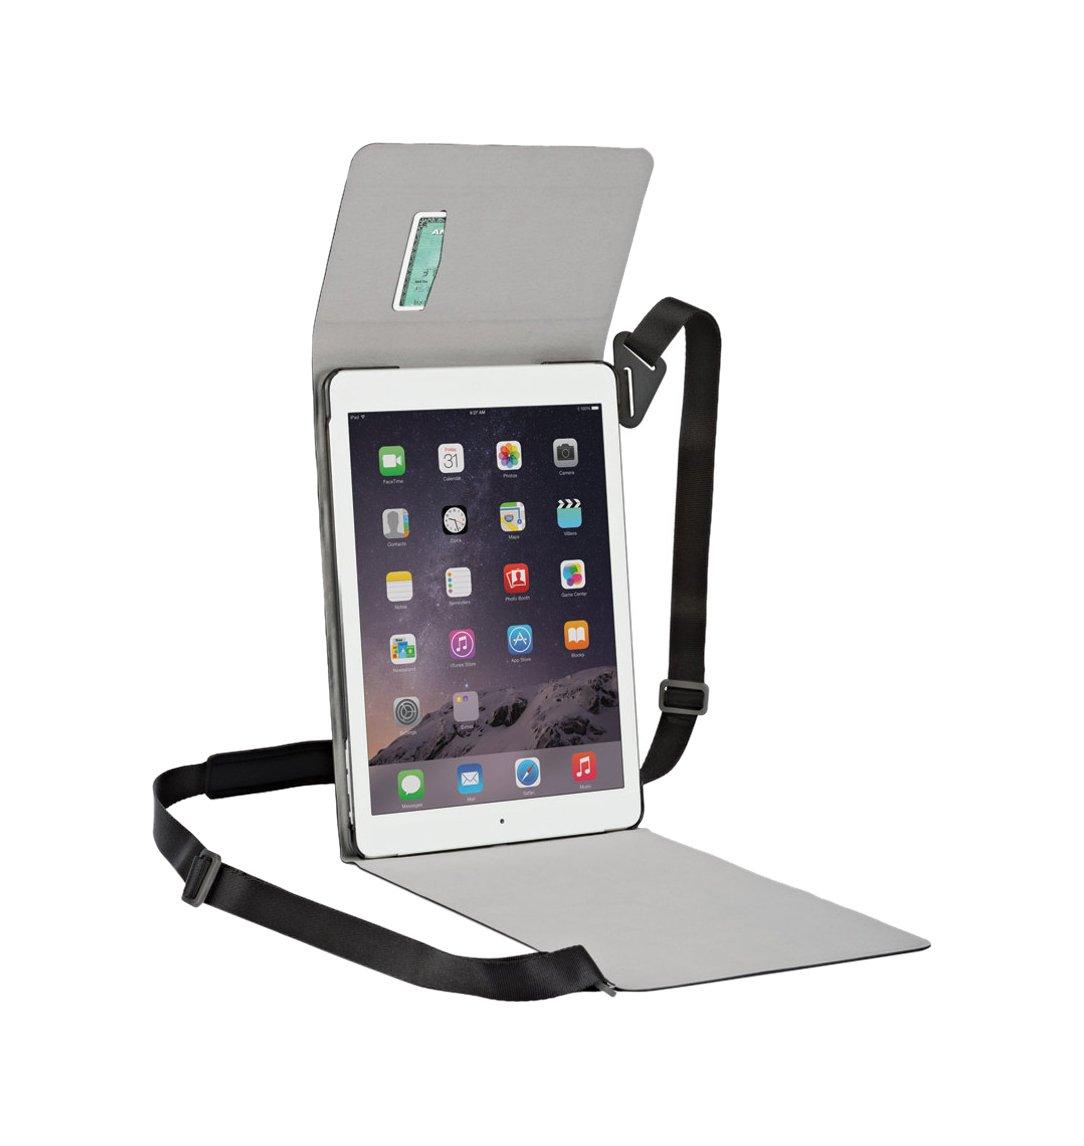 Acme Made Ergo Book bolsa para Apple iPad Air/Tablet de hasta 25,4 cm: Amazon.es: Informática